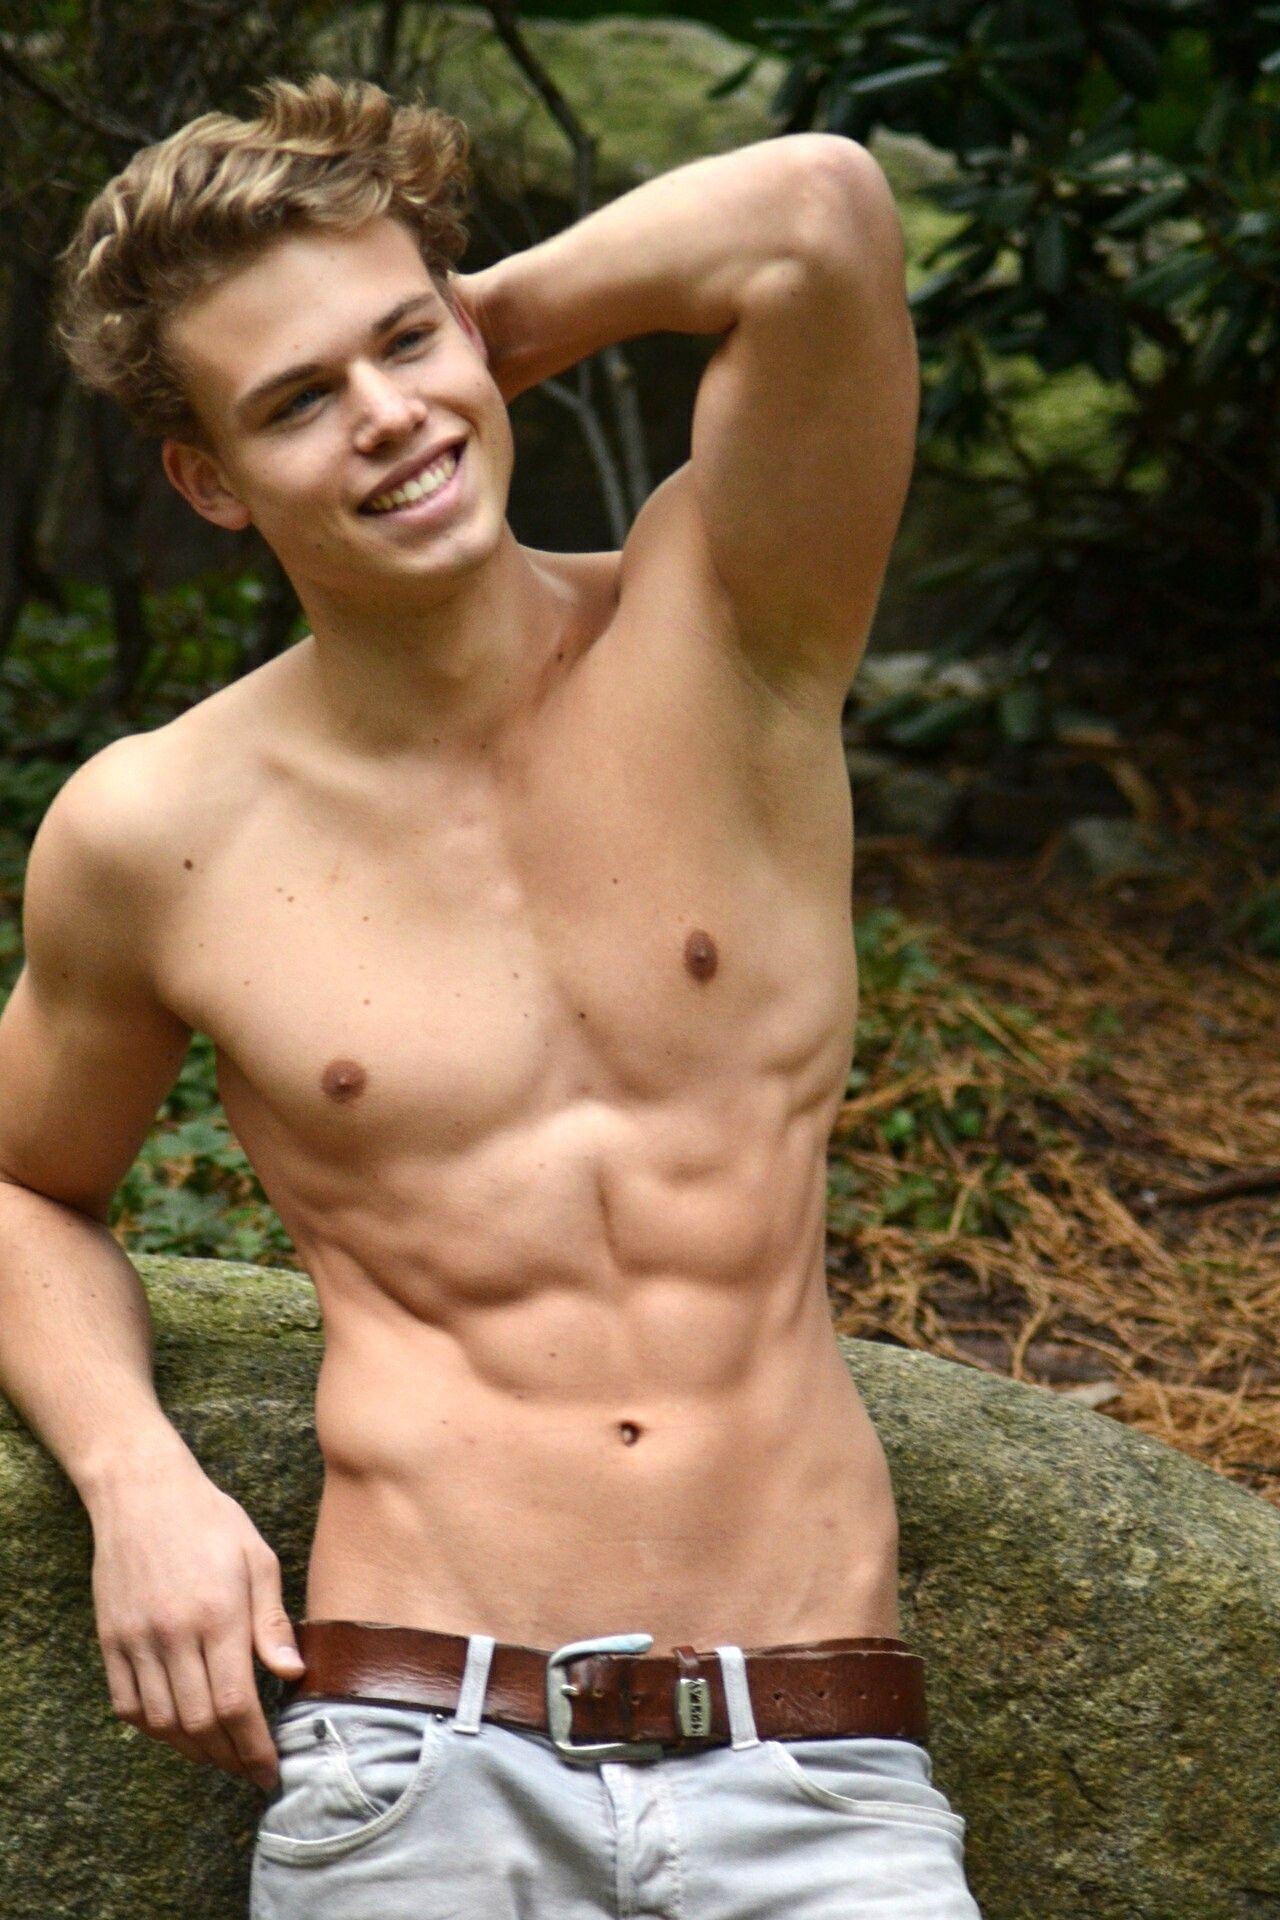 Source: somethingspecial4u   Cute Boys Showing Armpits